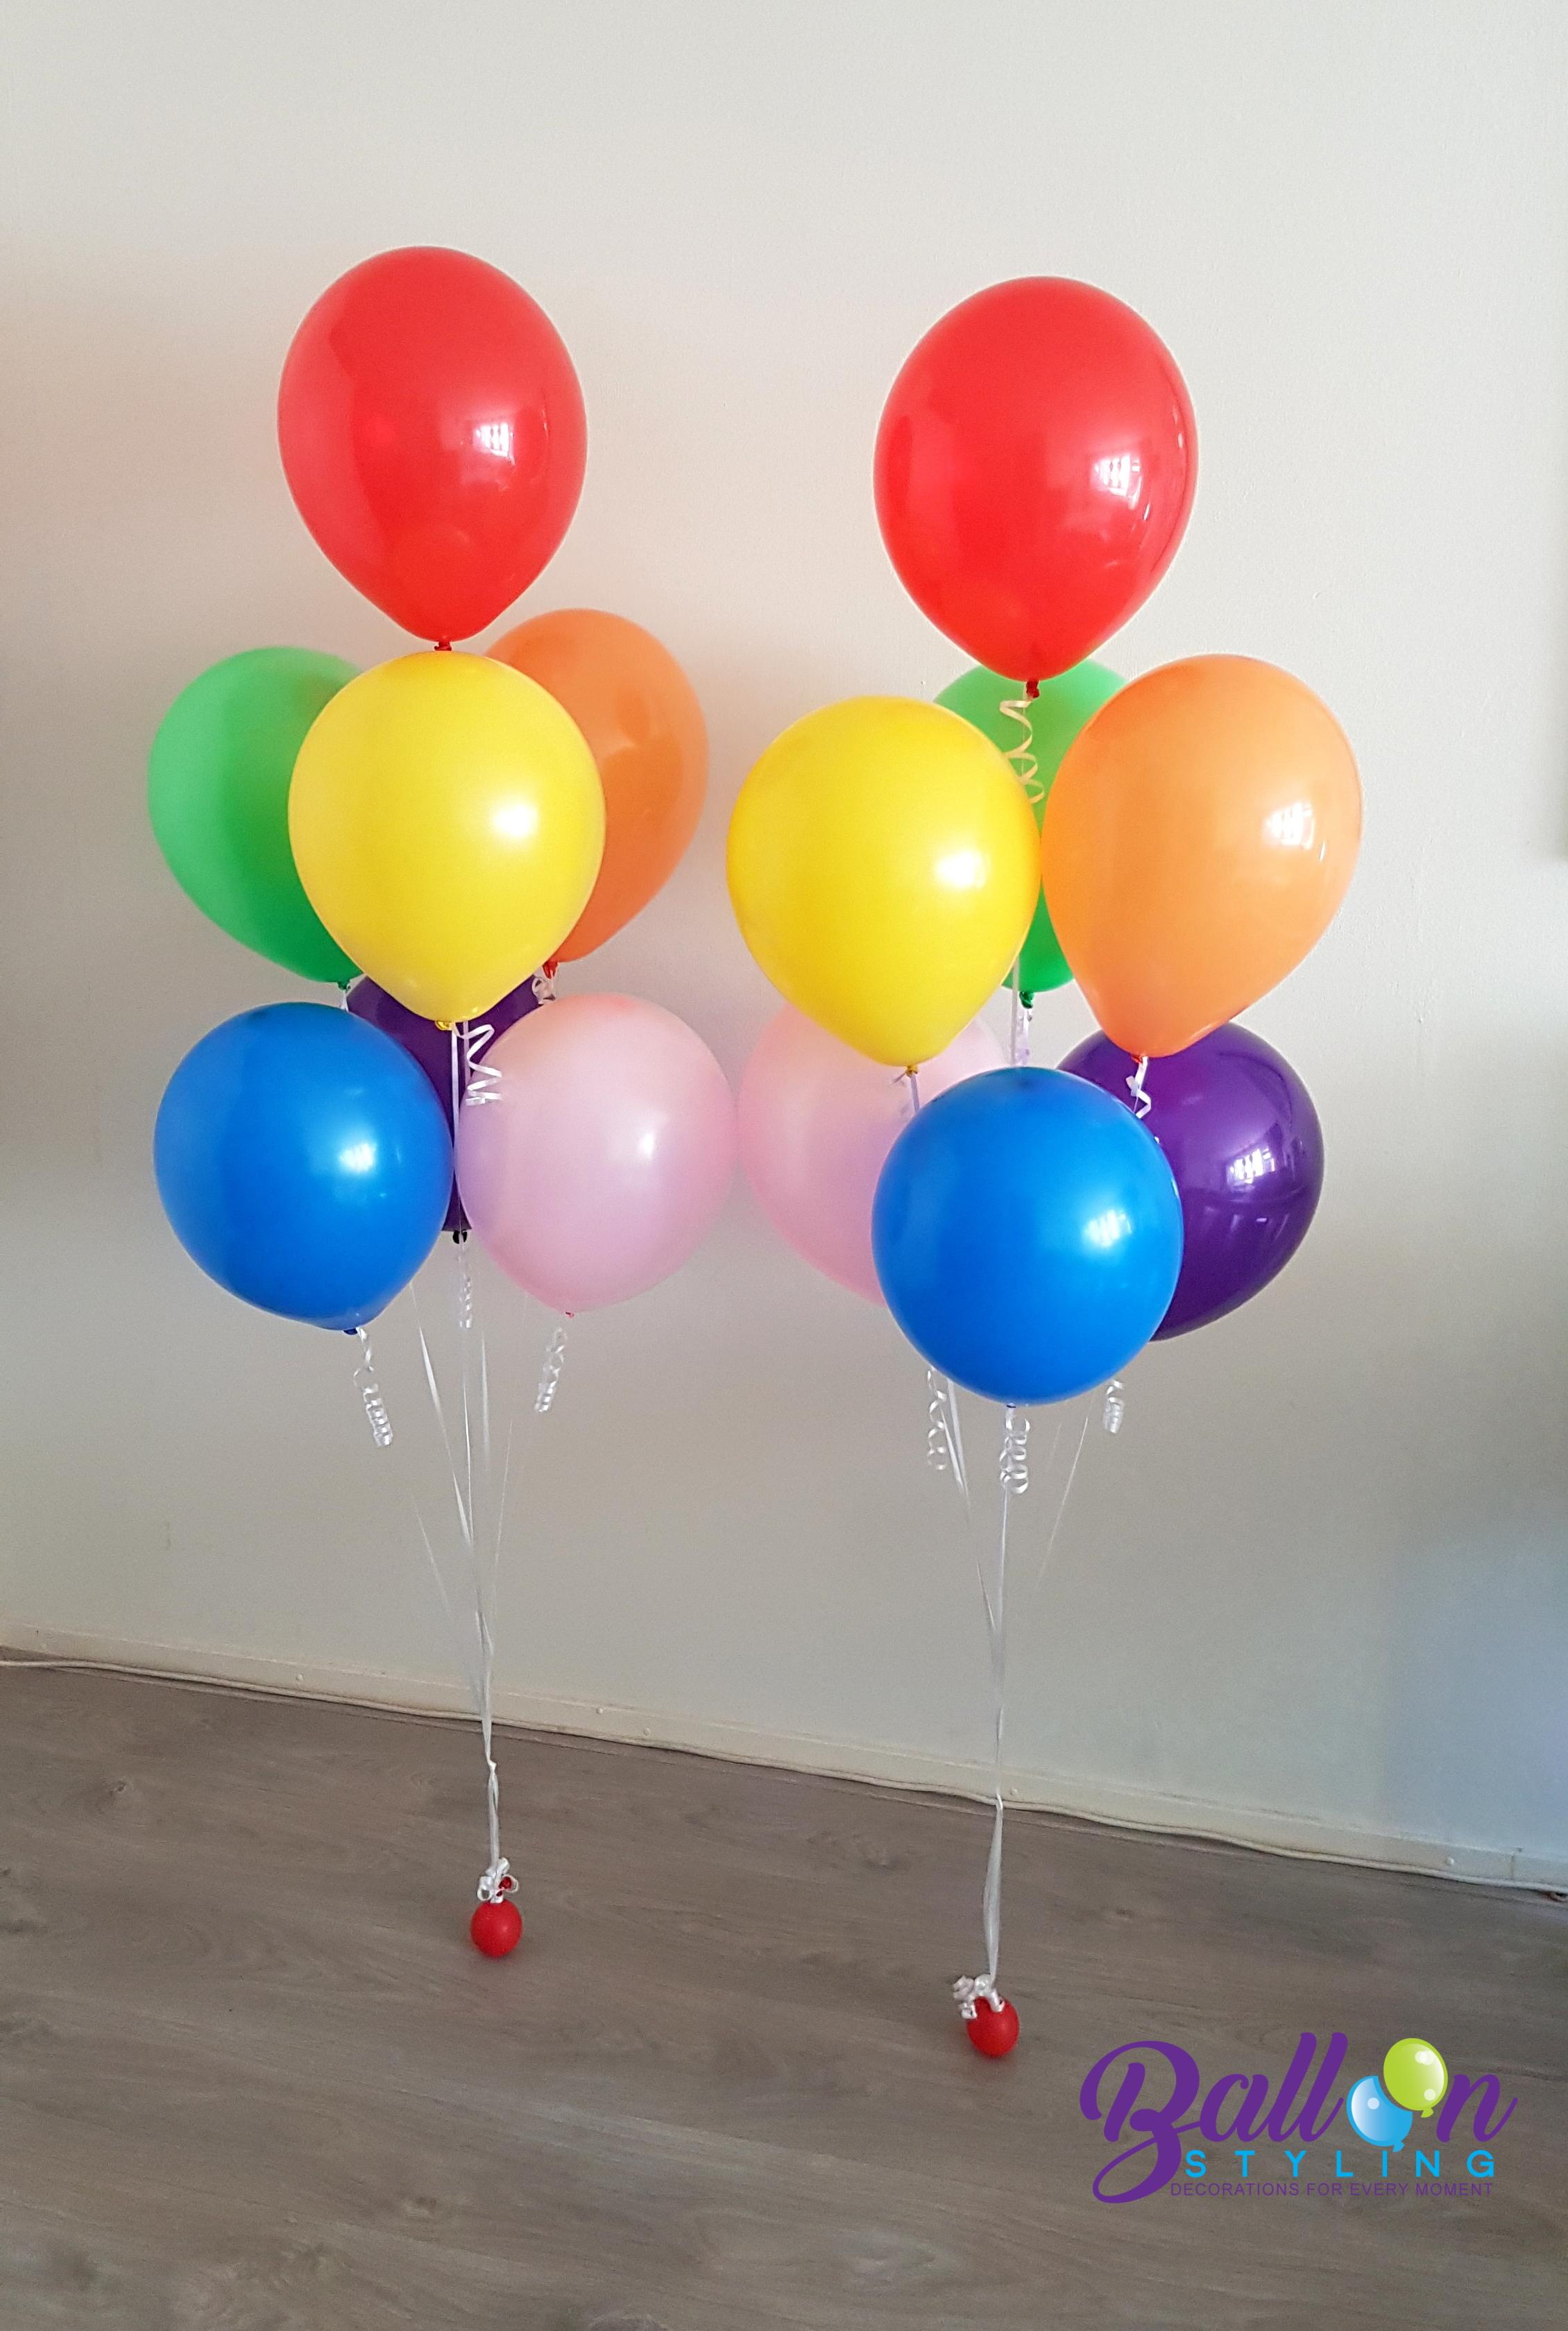 Heliumballonnen ballontrossen gronddecoratie vloerdecoratie tafeldecoratie verjaardagBalloon Styling Tilburg